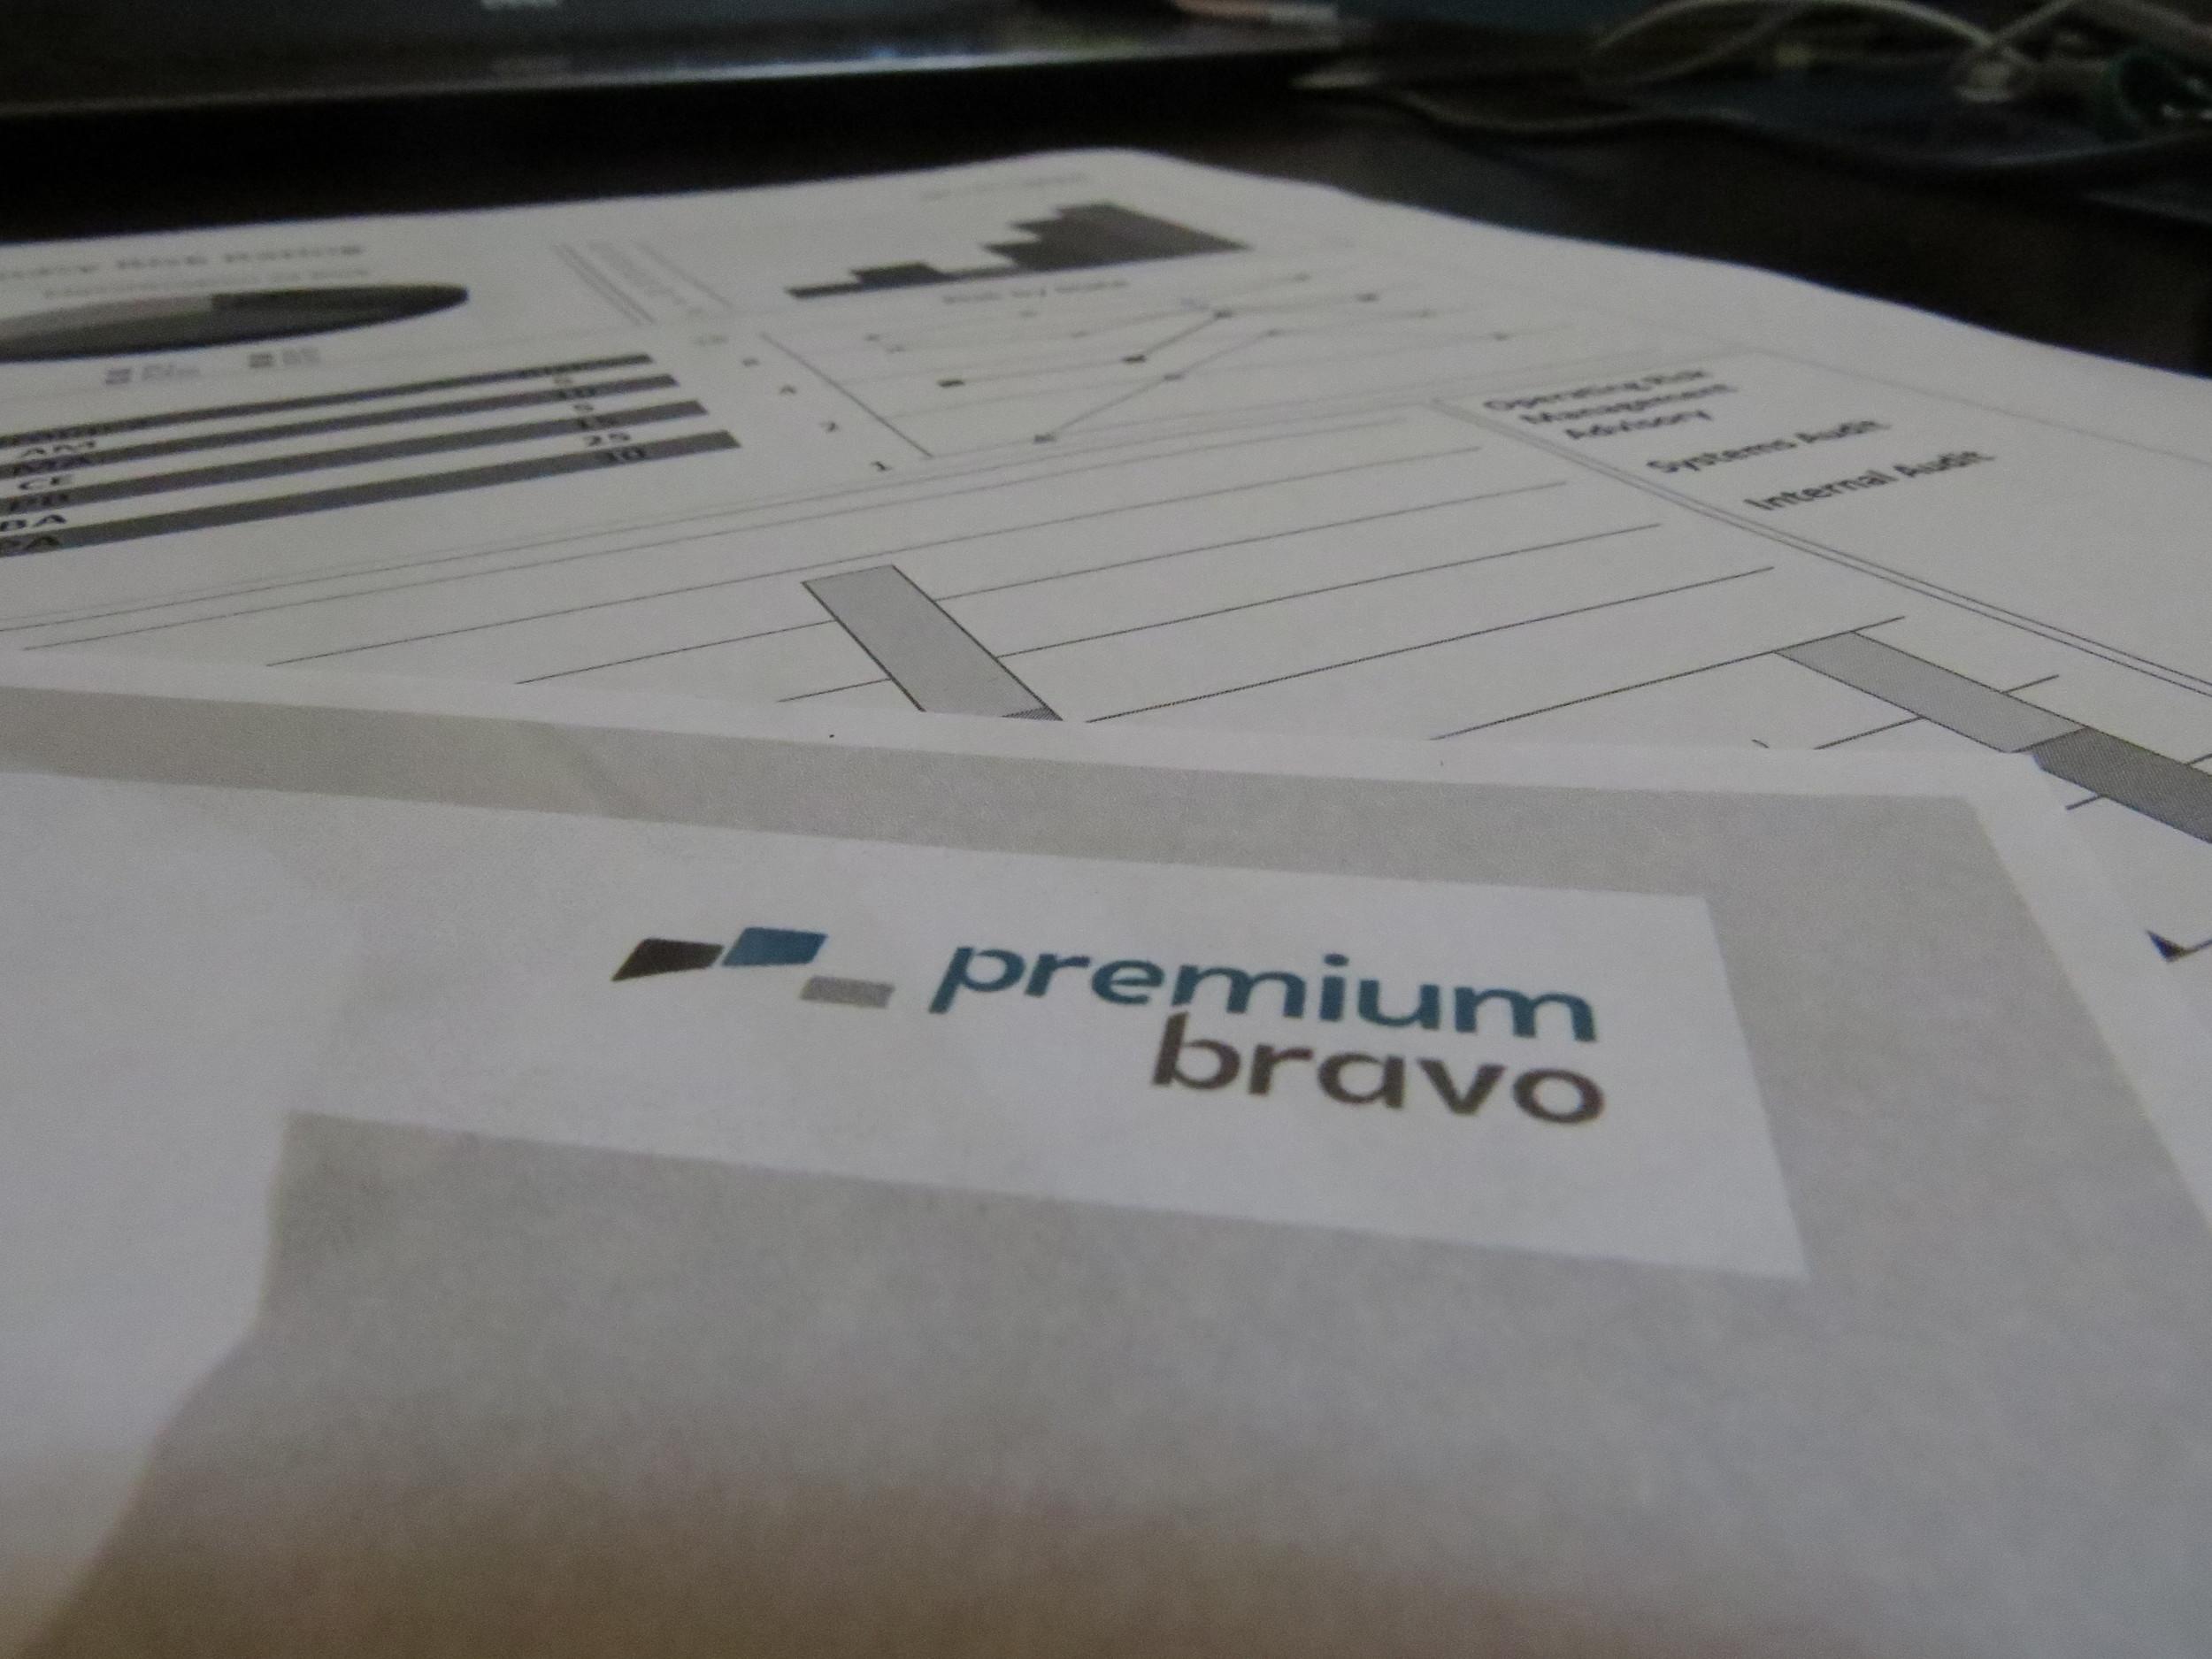 premiumbravo-business-risk-managment